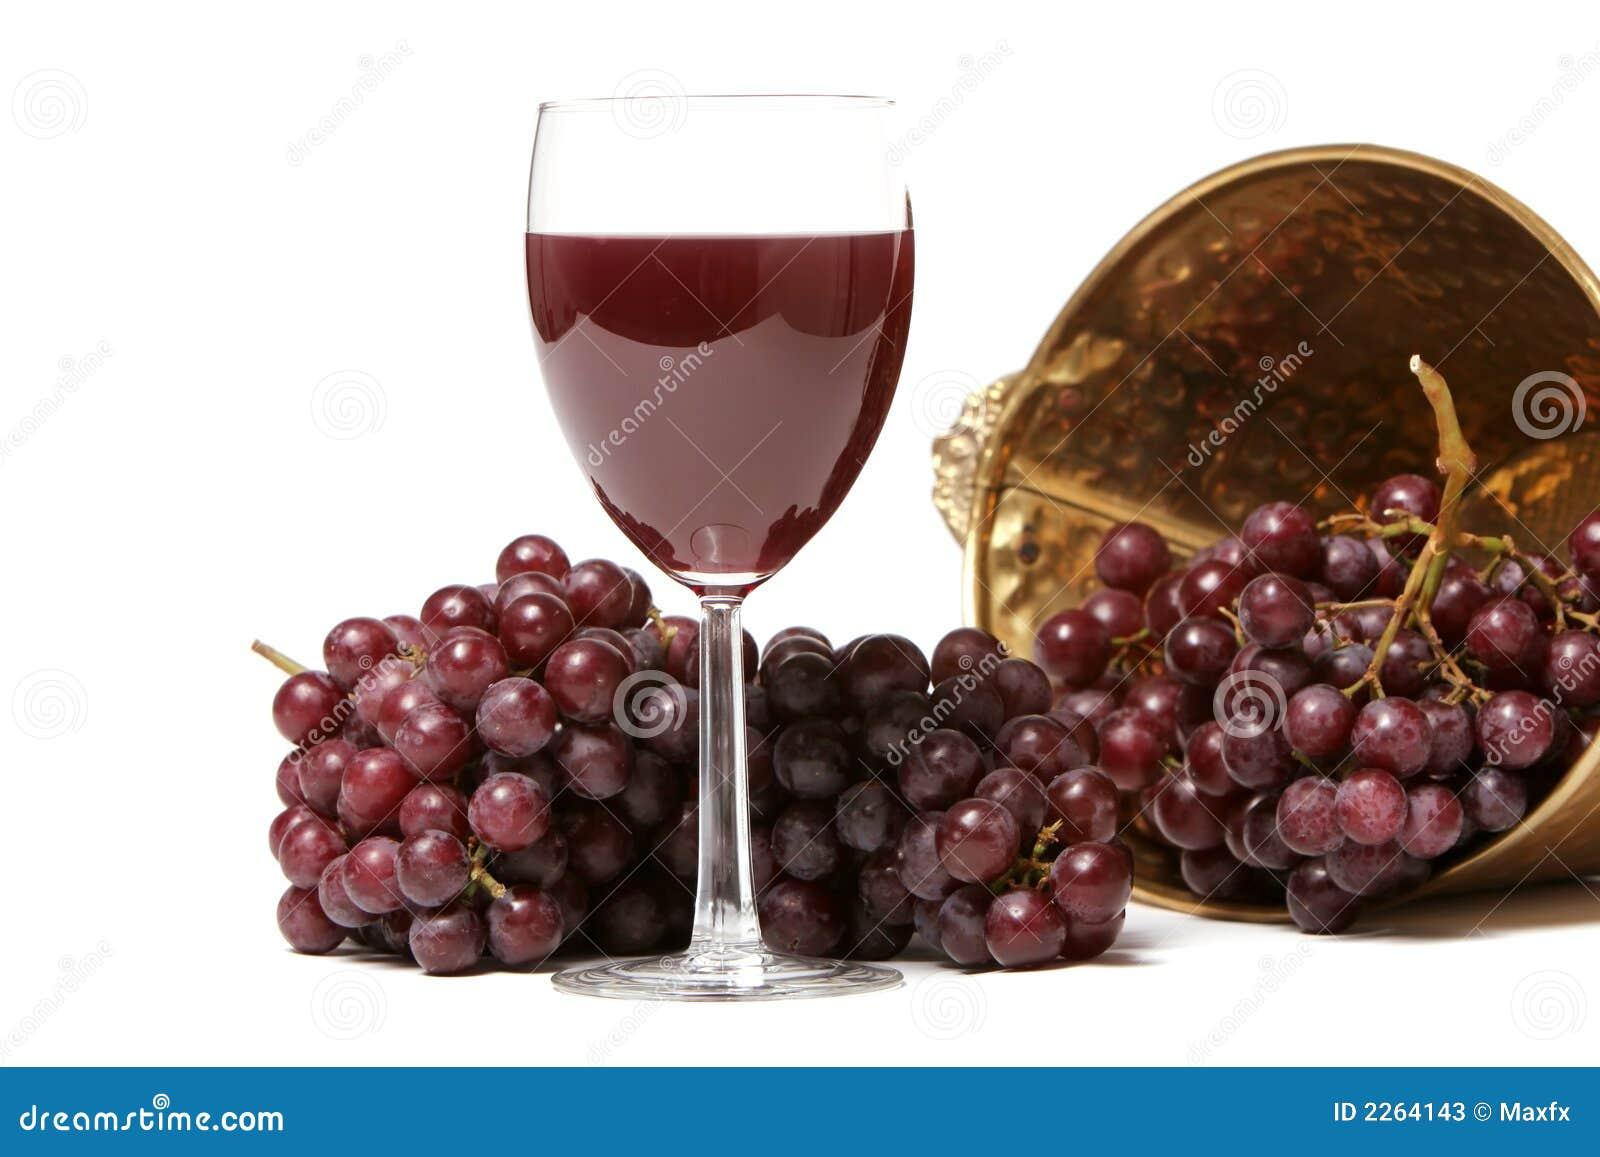 Домашнее красное вино из винограда рецепт